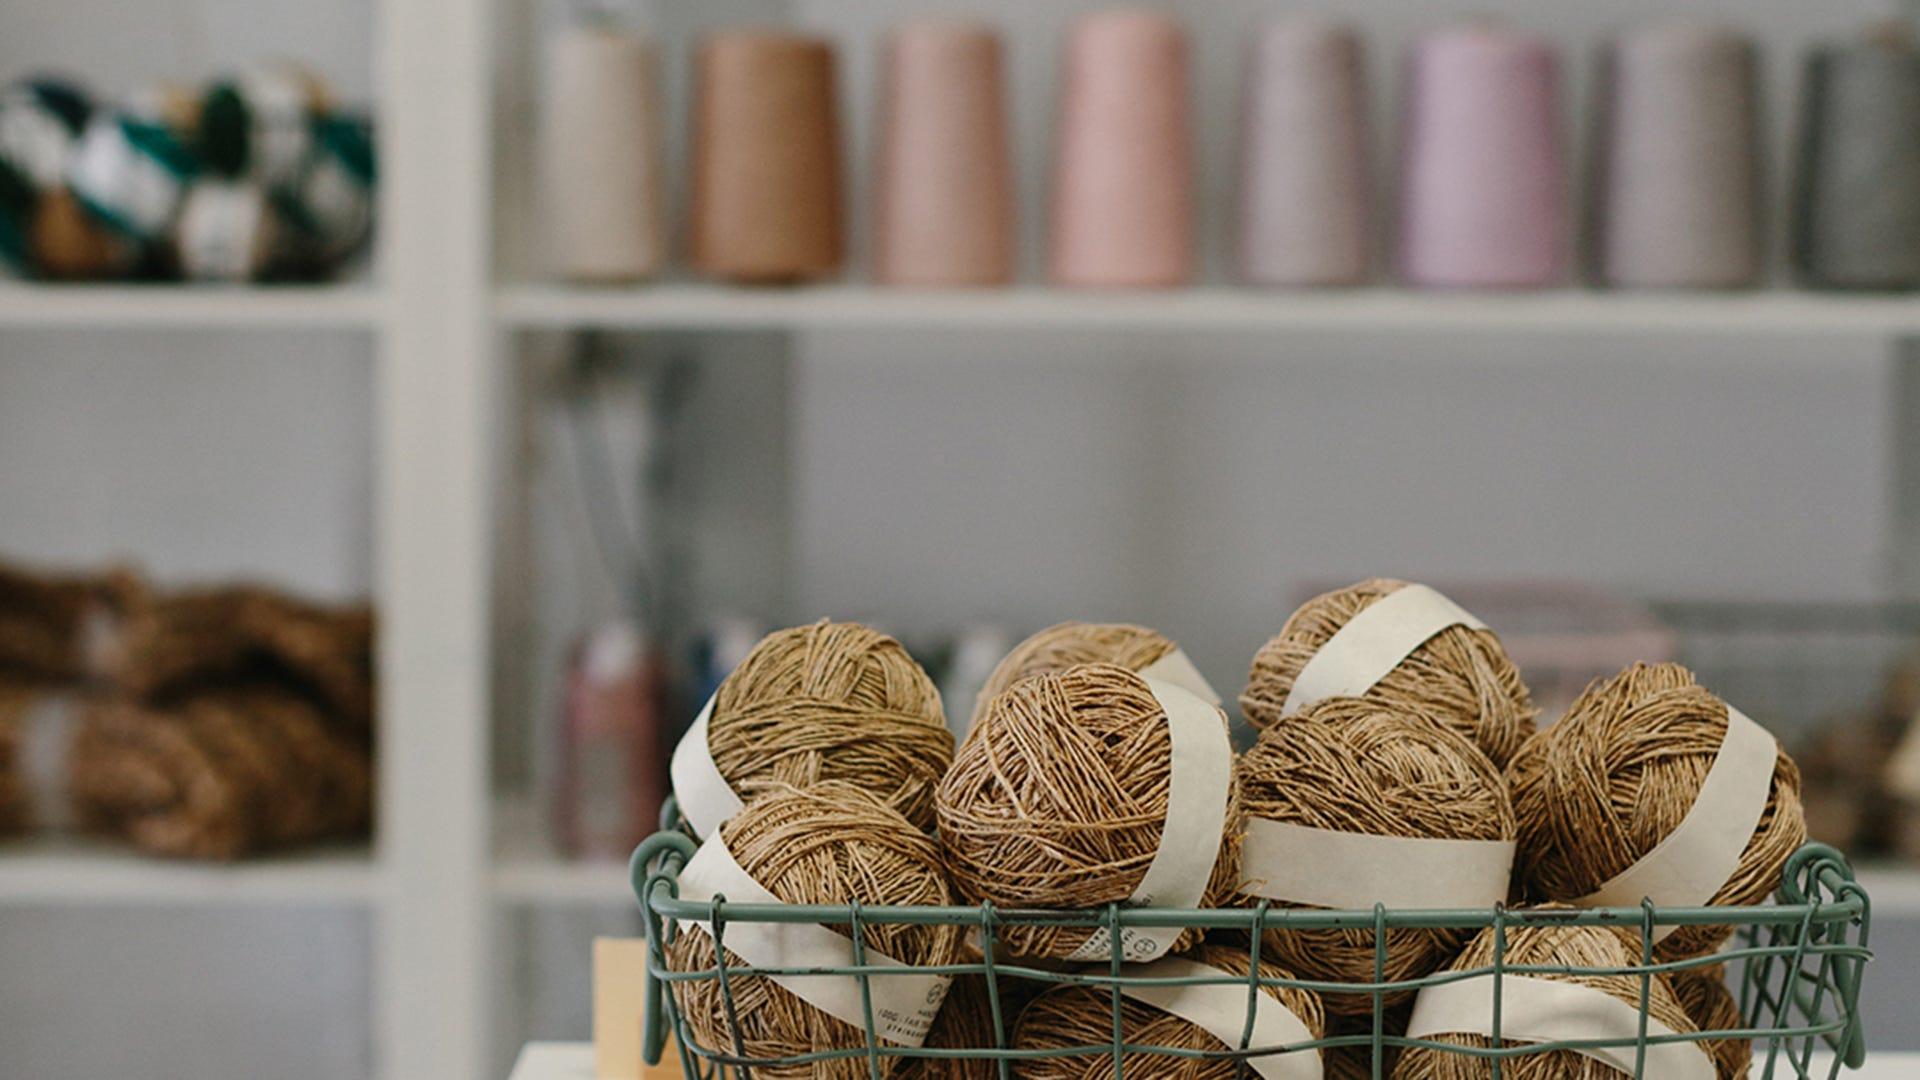 String Harvest balls of string